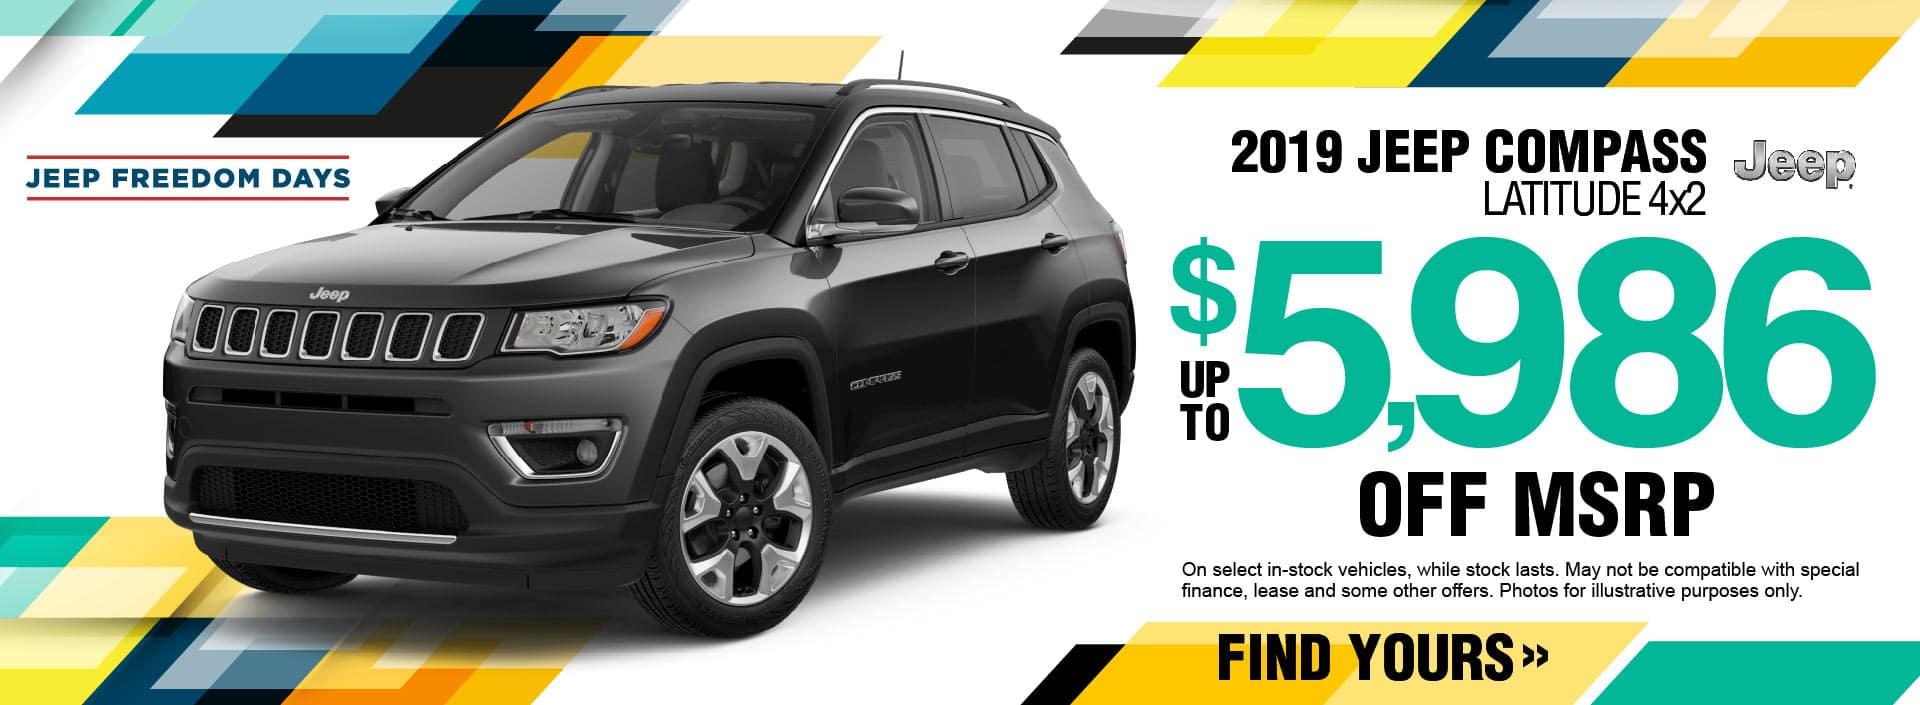 2019 Jeep Compass Savings